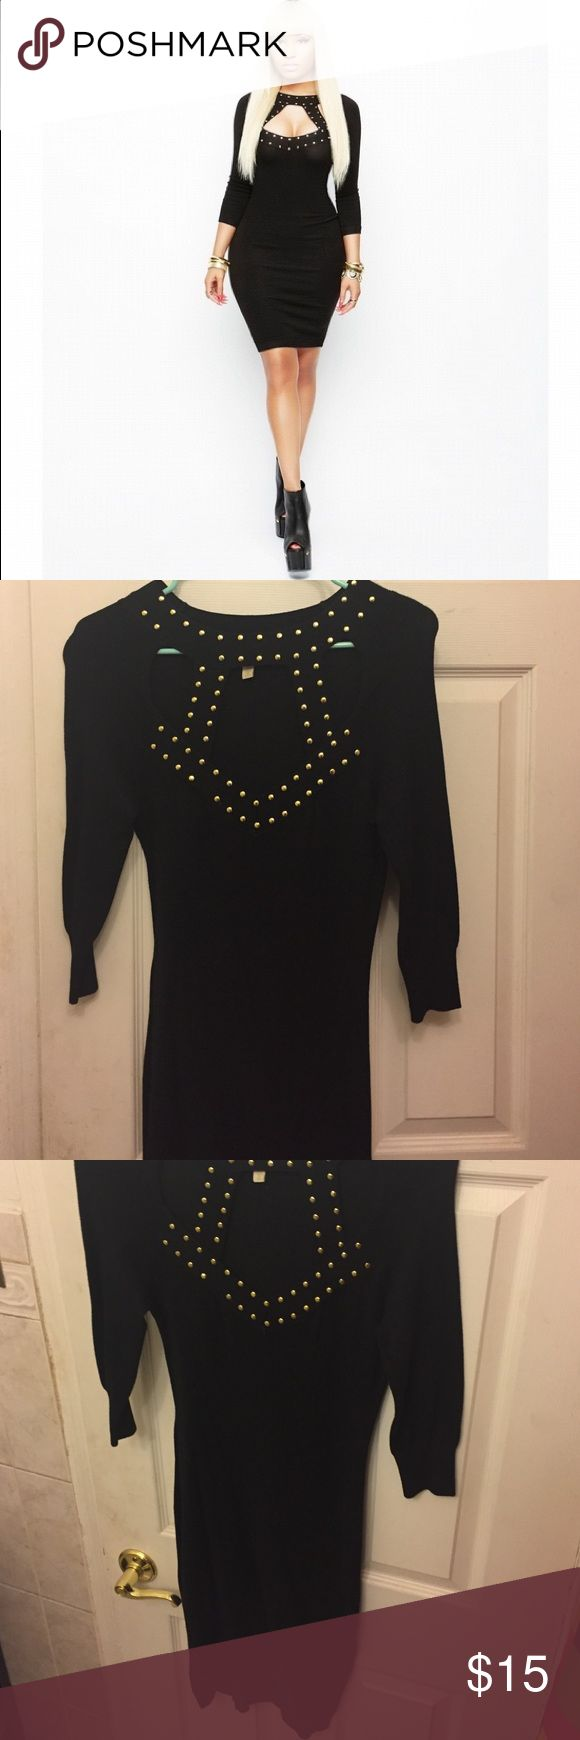 Nicki Minaj black sweater dress Gently worn cagged black nicki Minaj sweater midi dress. Super sexy ! Great for New Years!! Nicki Minaji  Dresses Midi